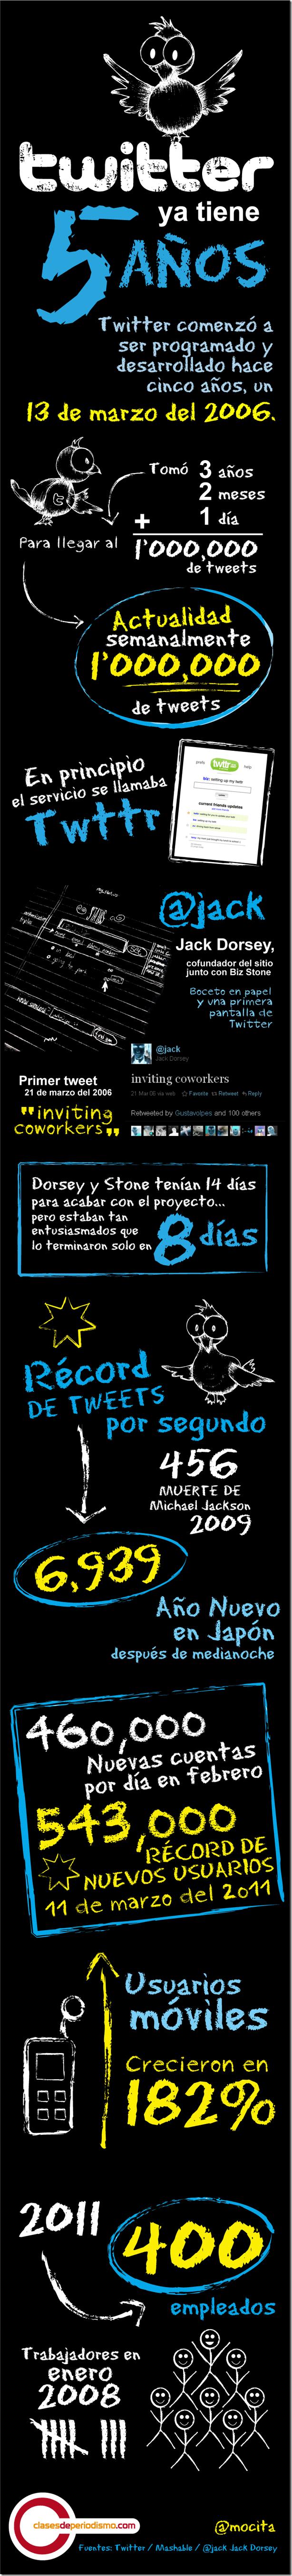 twitter-5-cdp1